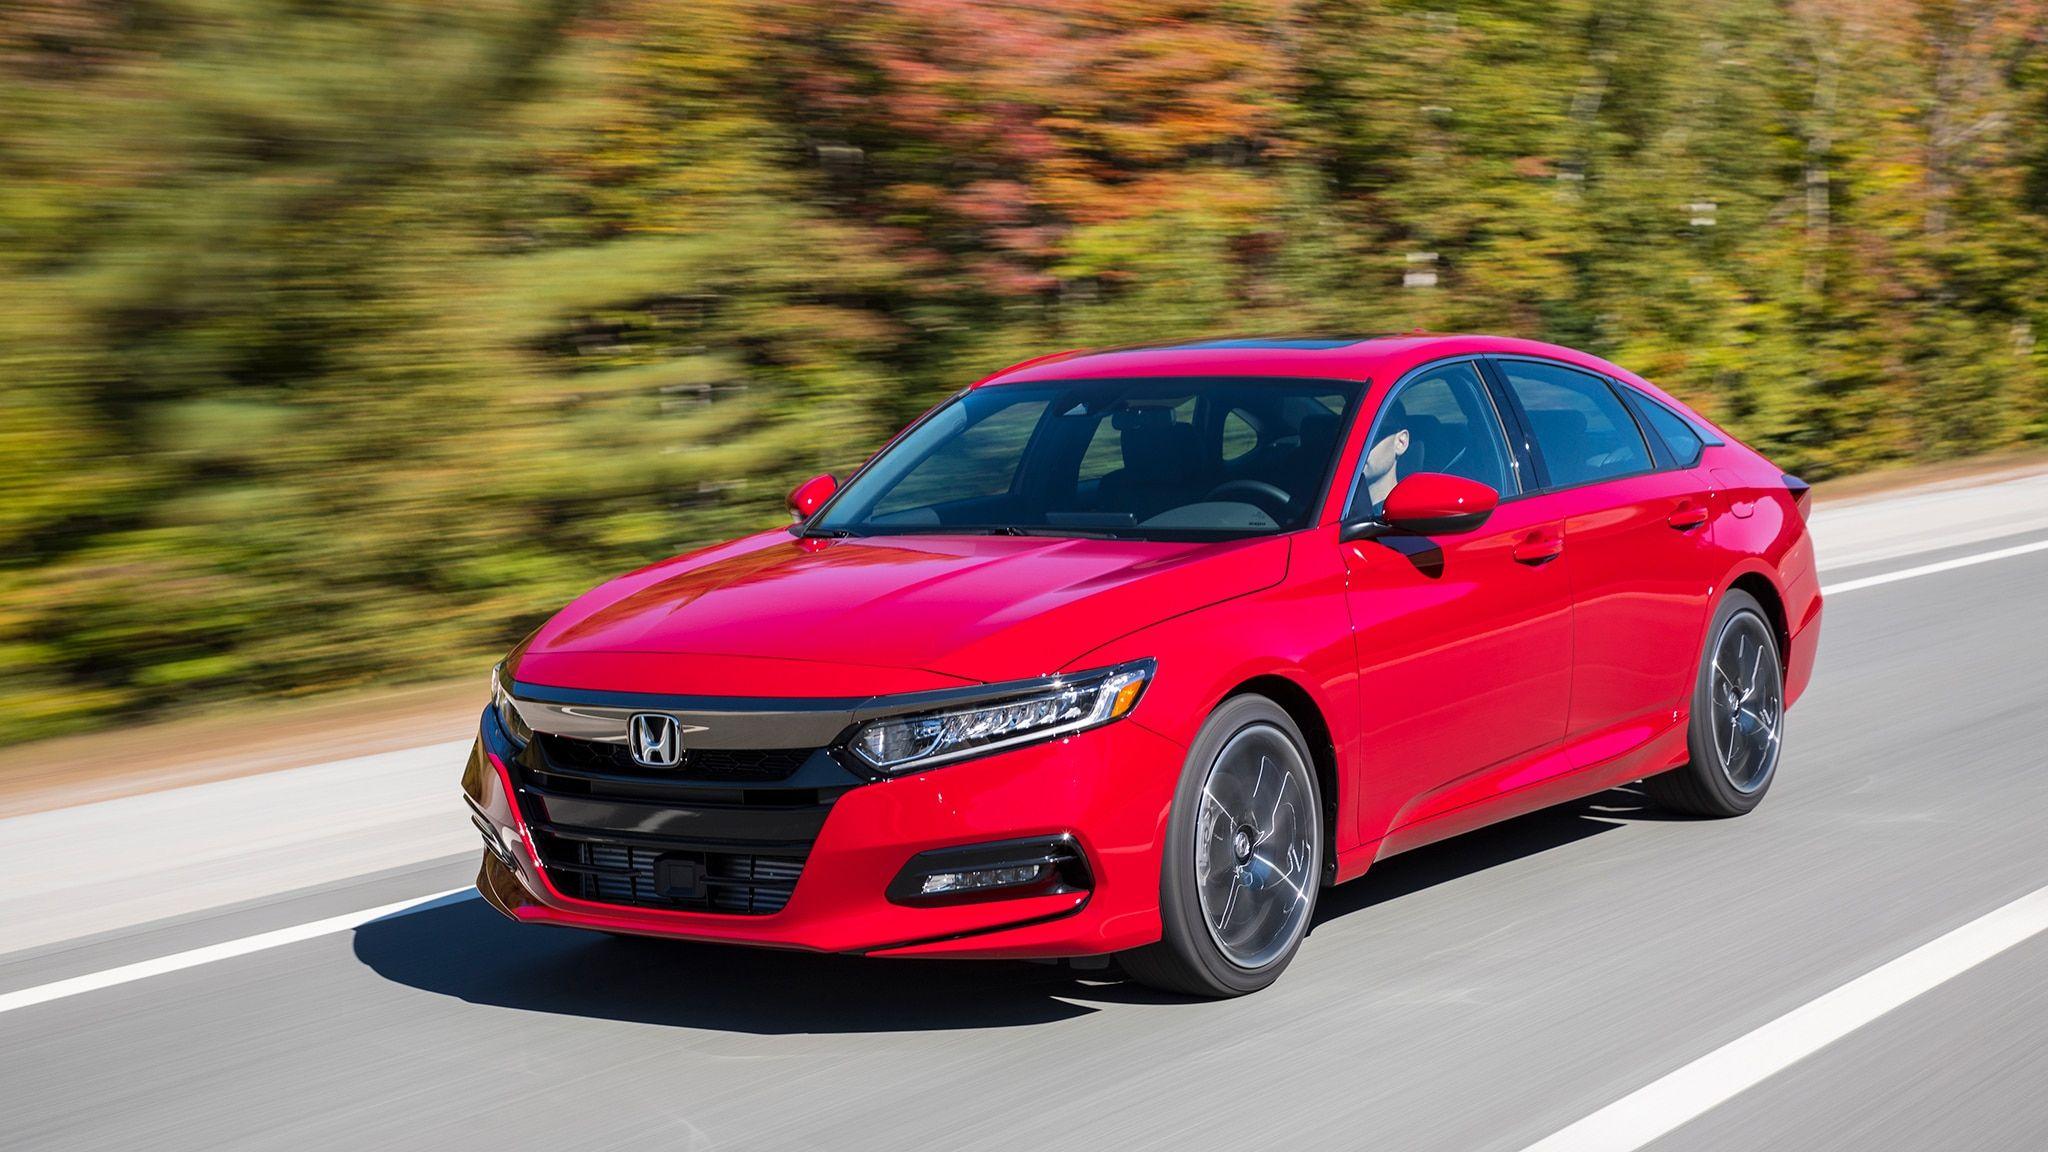 Honda Accord 2020 Price, Changes, Features, Interior